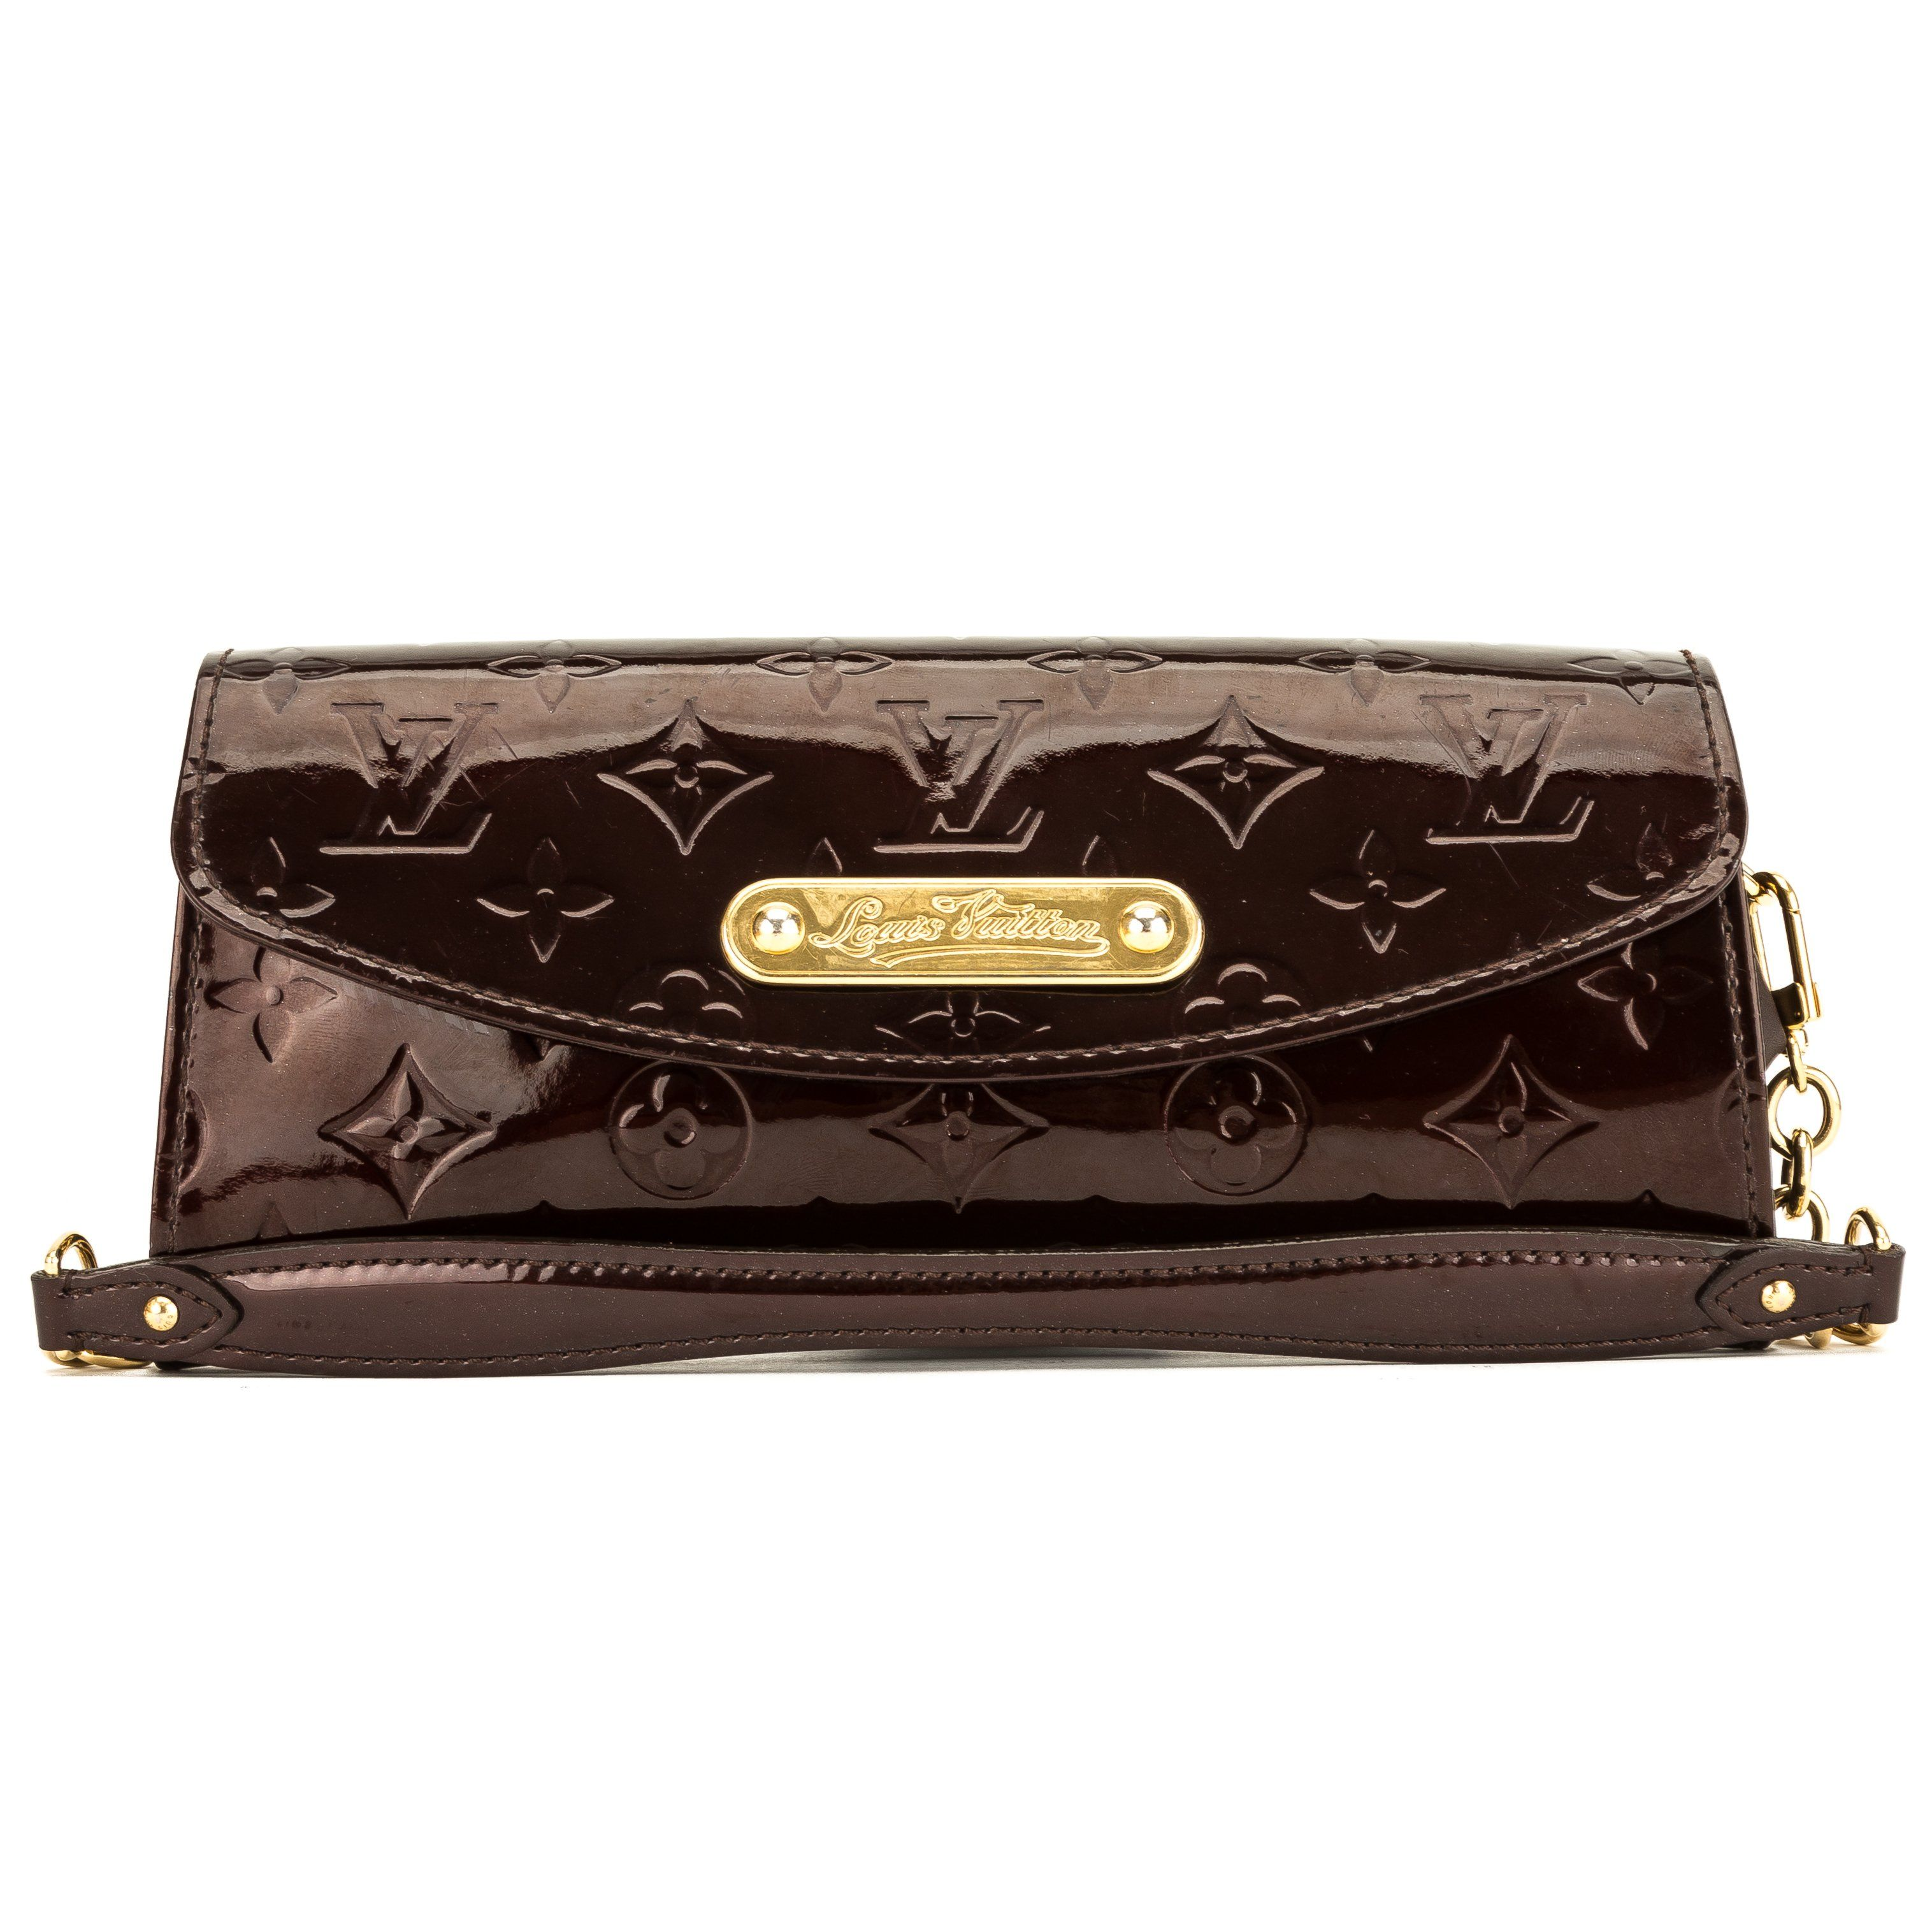 cda7c78c27 Louis Vuitton Amarante Monogram Vernis Leather Sunset Boulevard Bag (Pre  Owned)